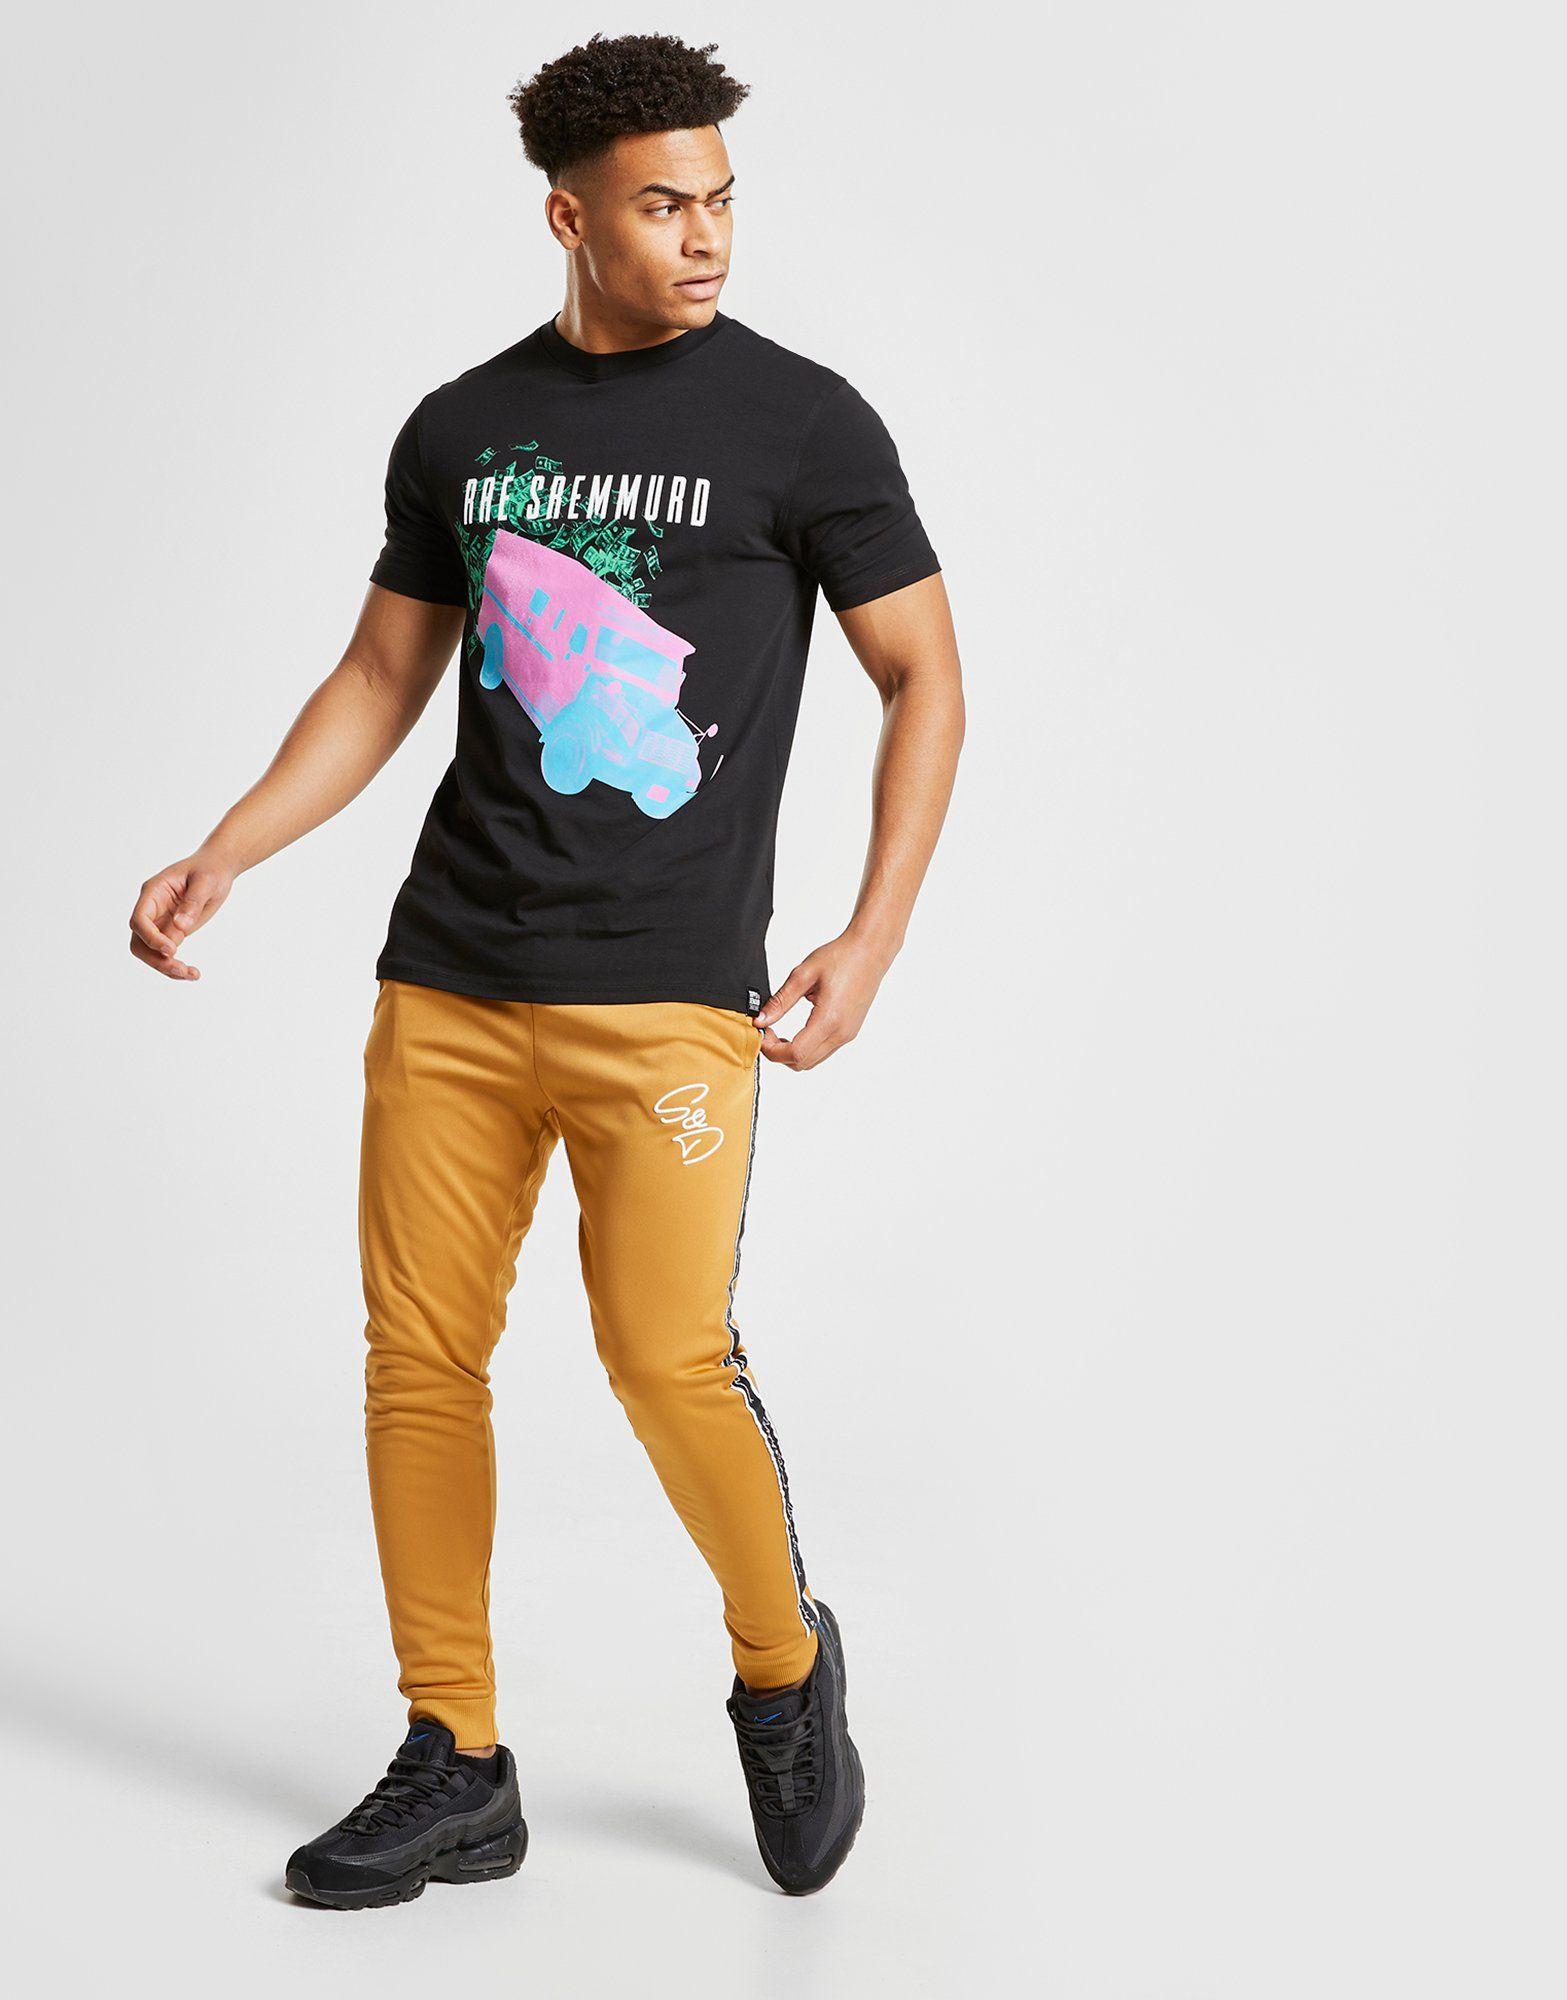 Supply & Demand Rae Sremmurd T-Shirt